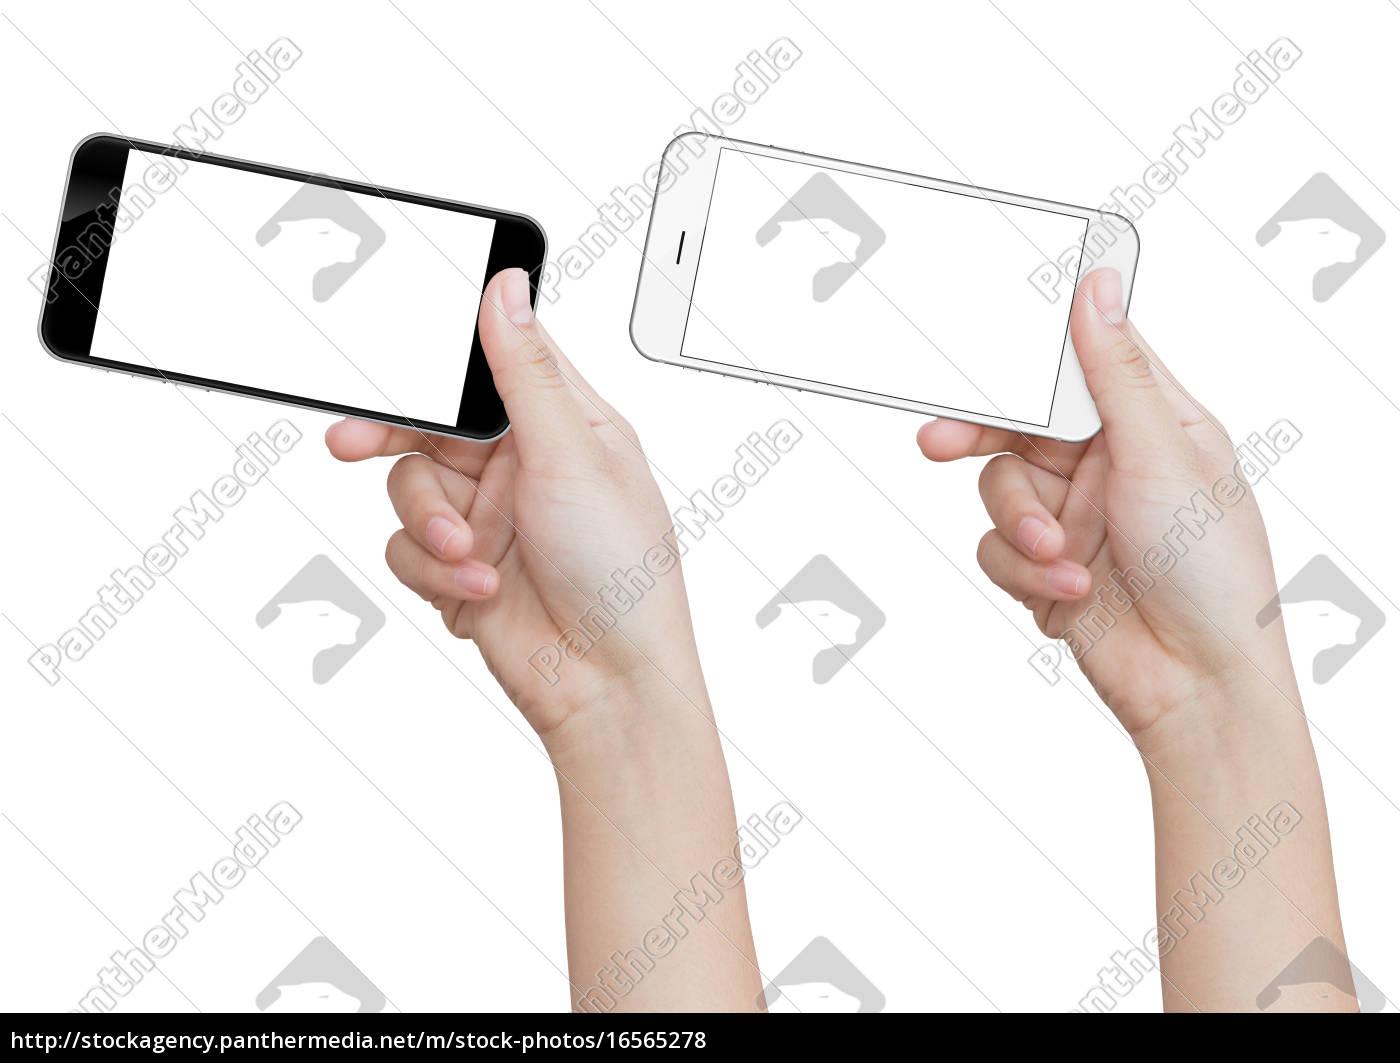 hand, holding, phone, isolated, on, white - 16565278